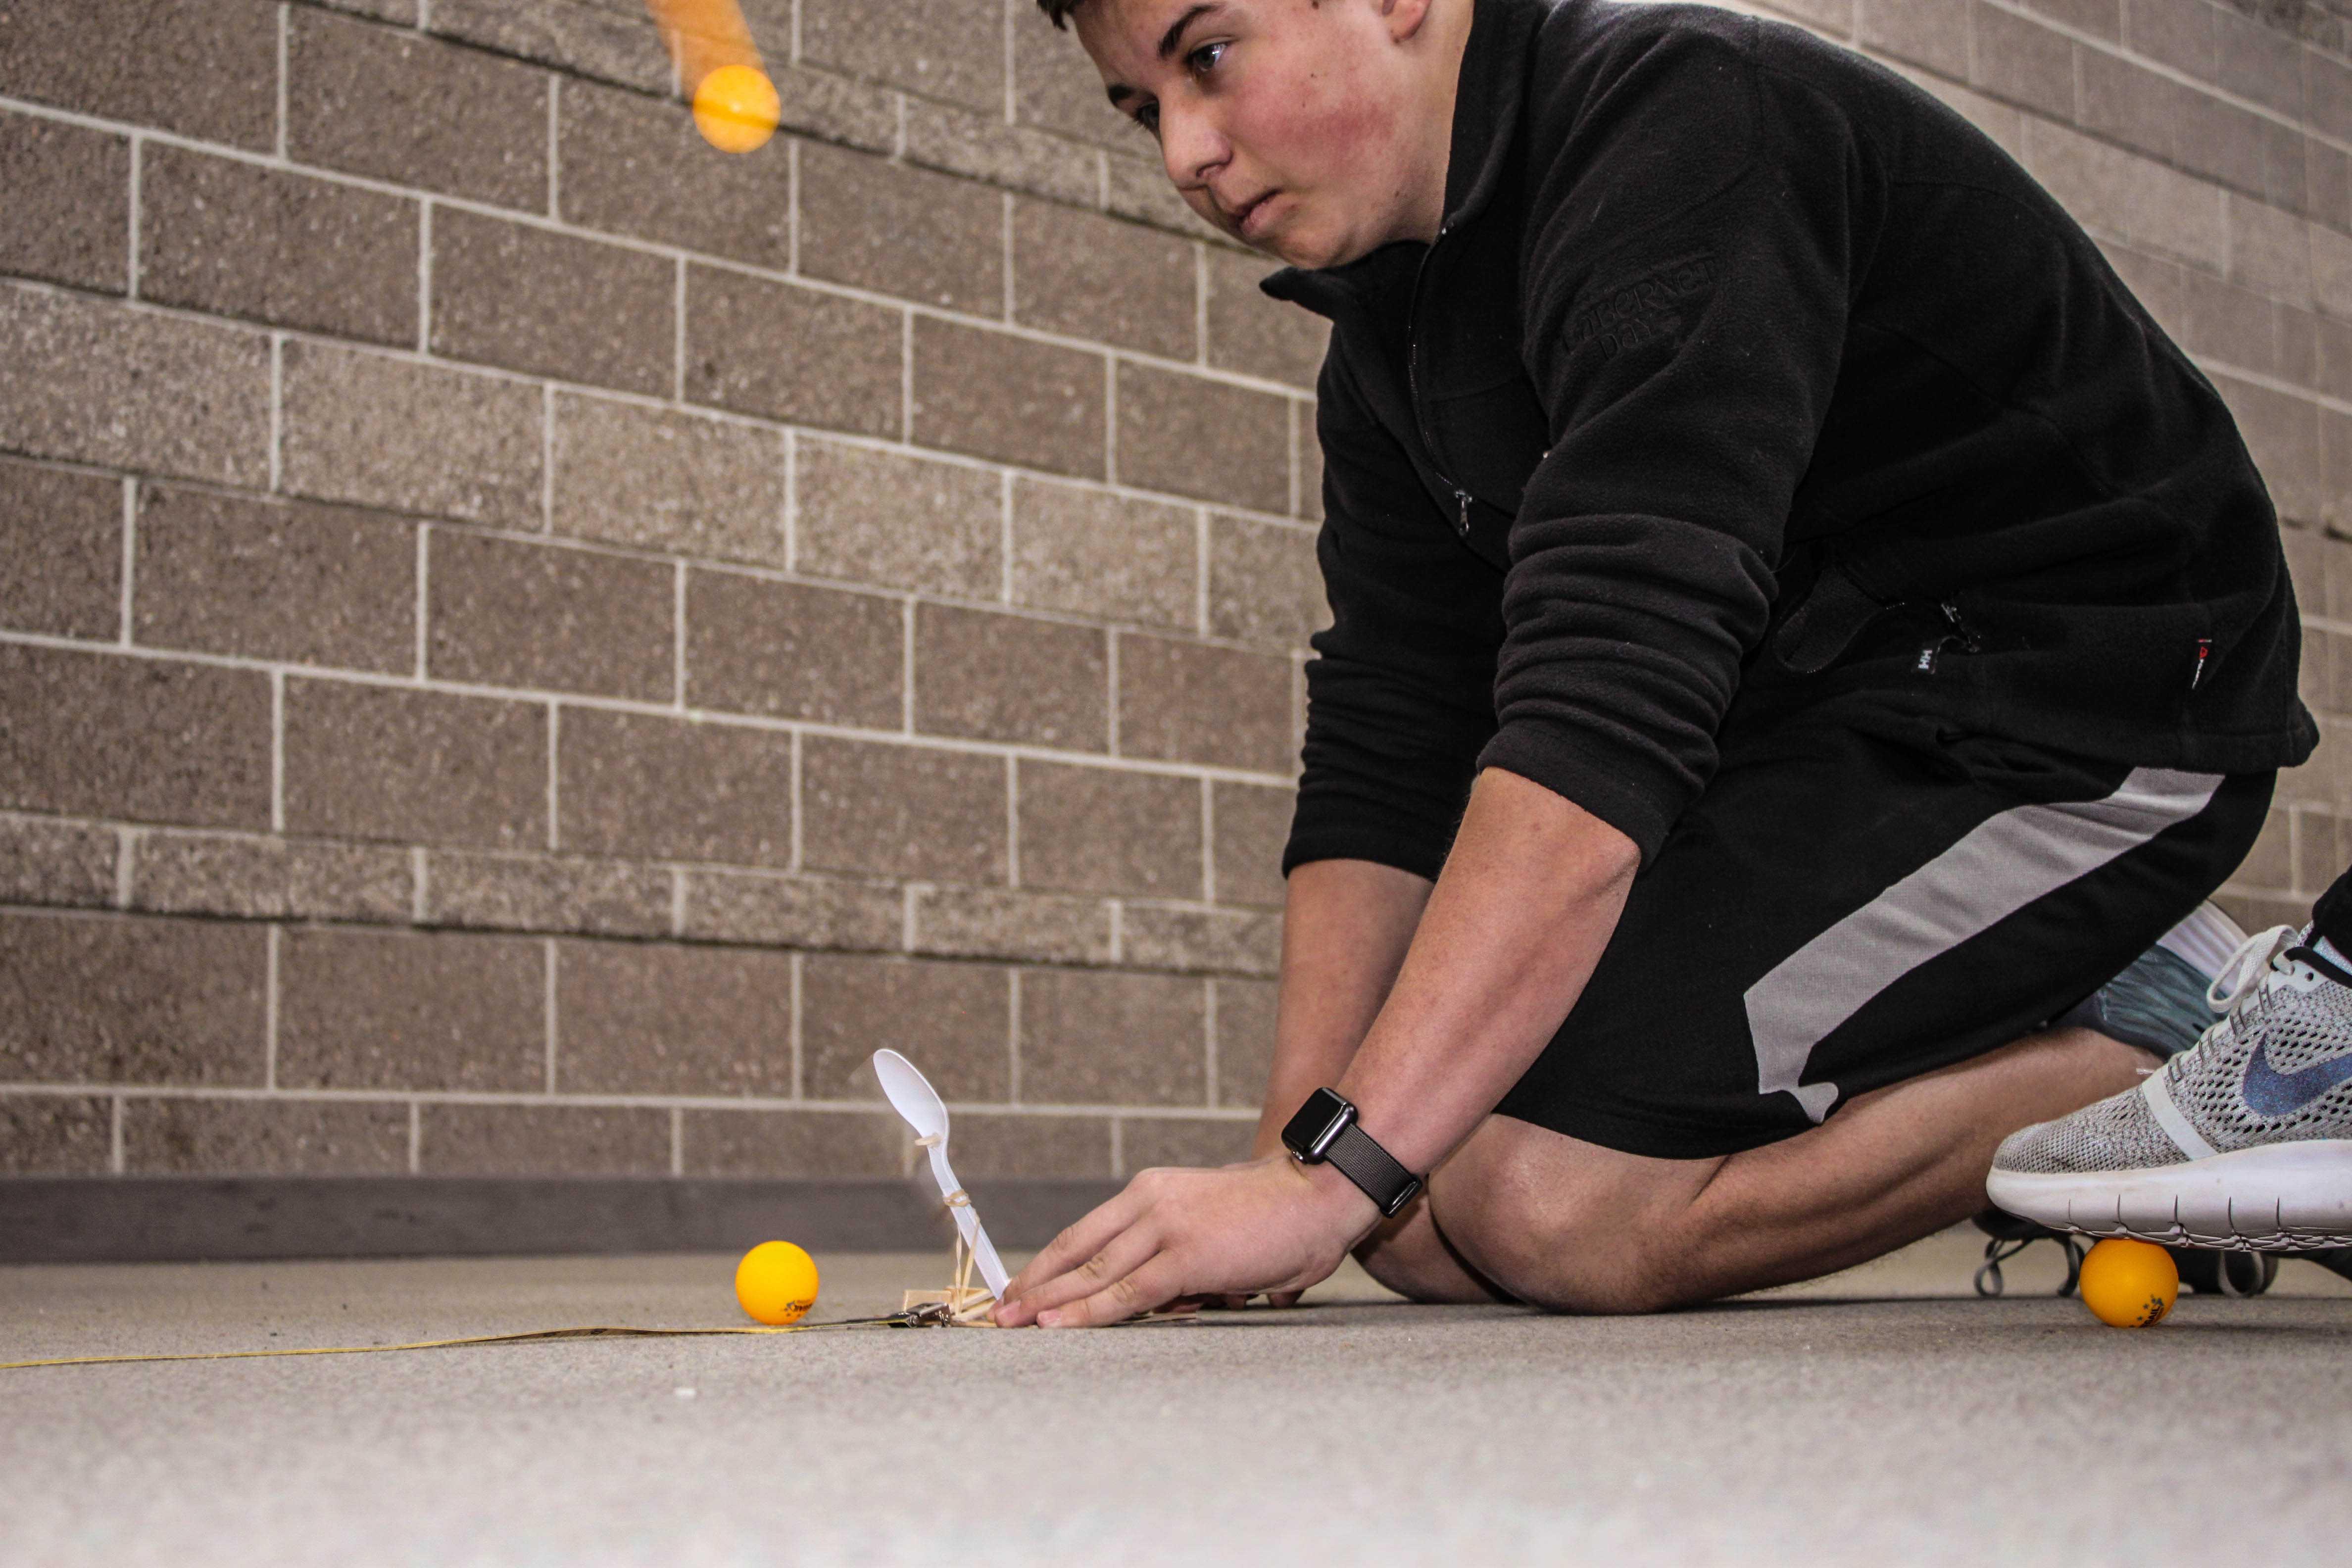 PHOTOS: Engineering I Catapults